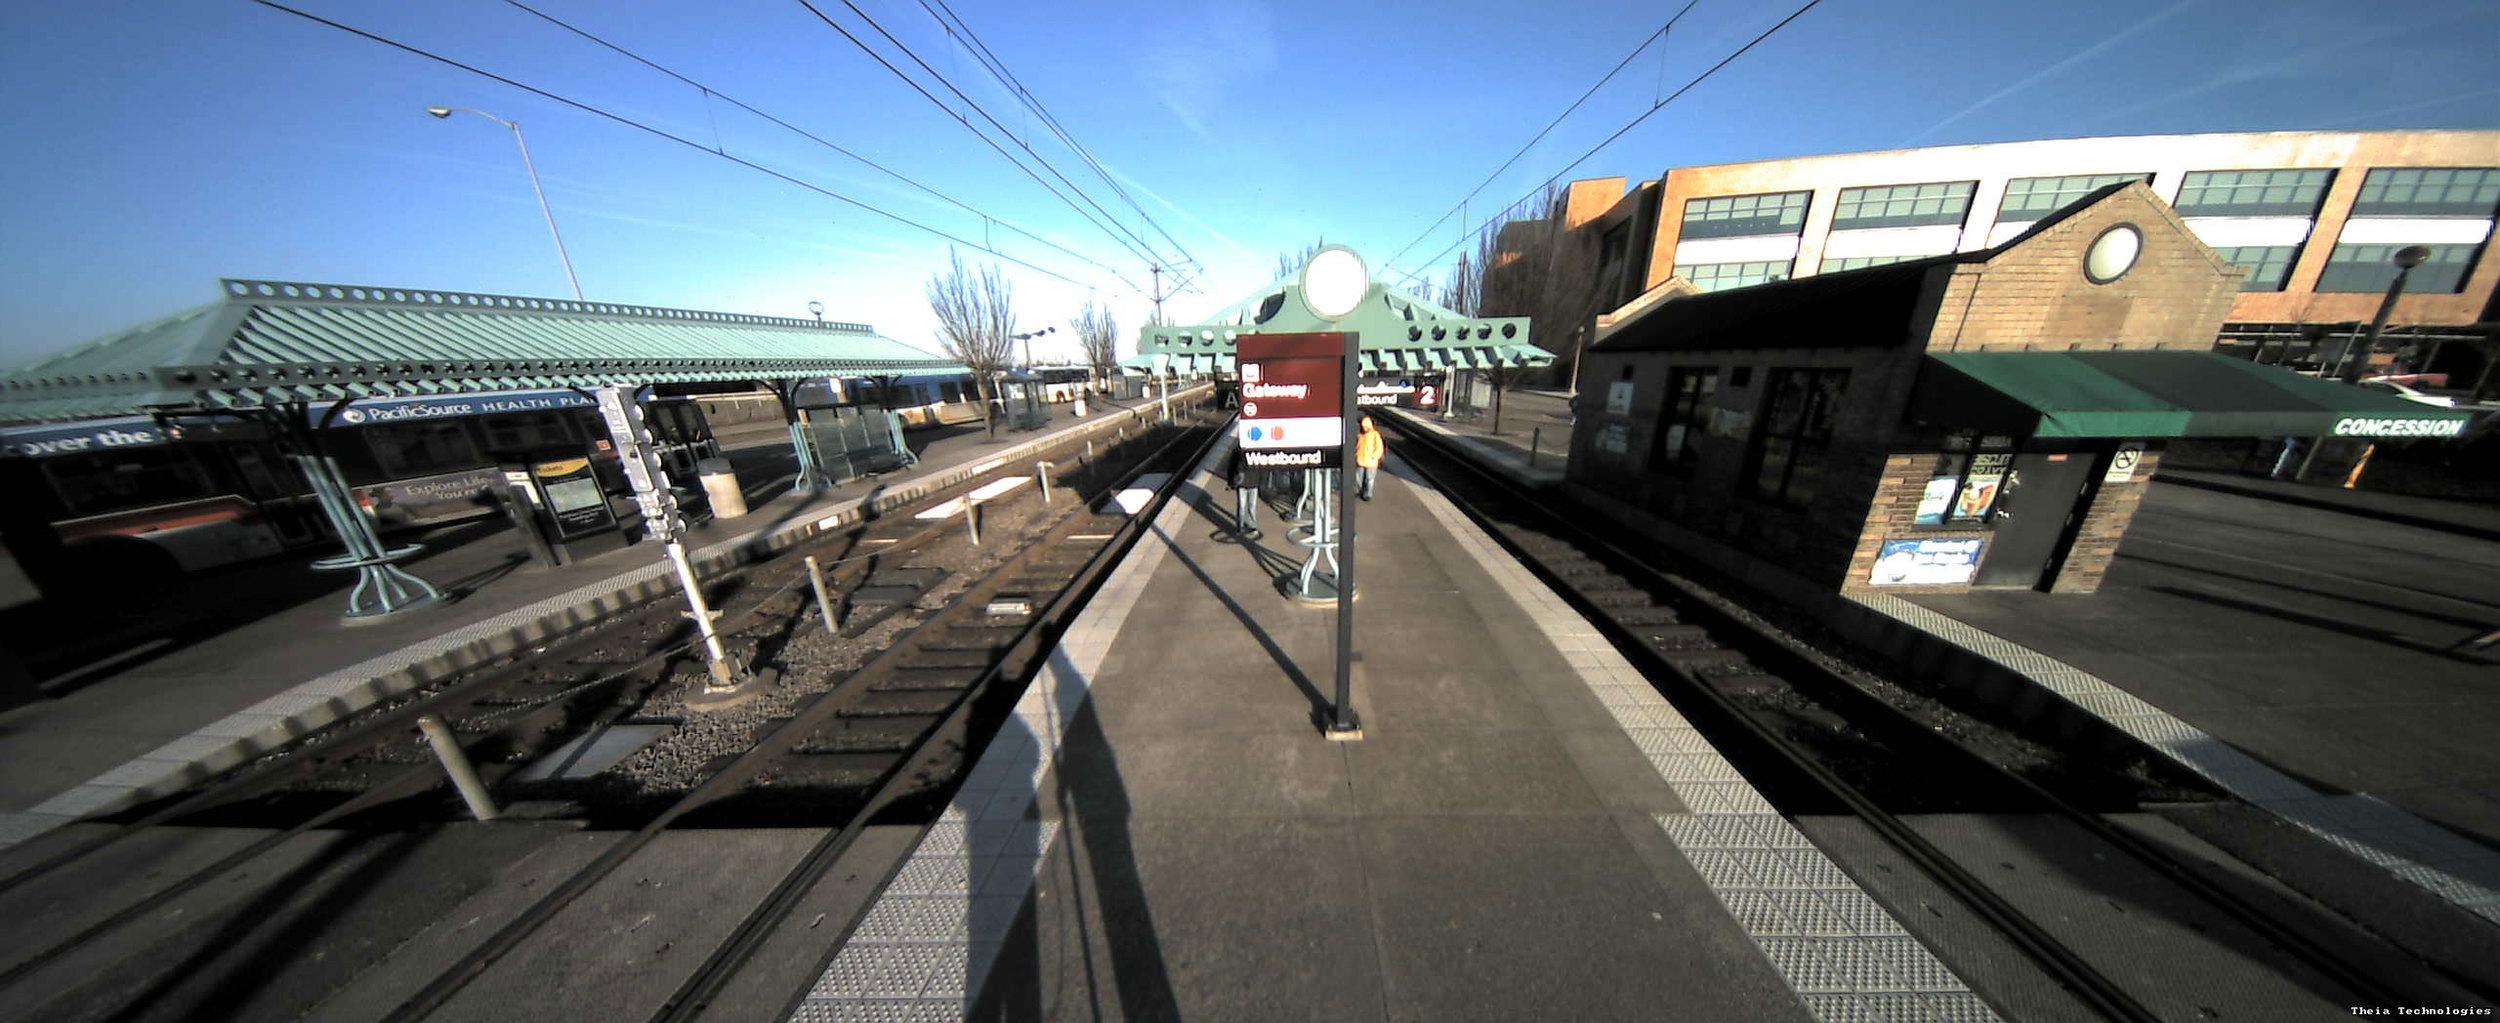 Lightrail_platform.jpg